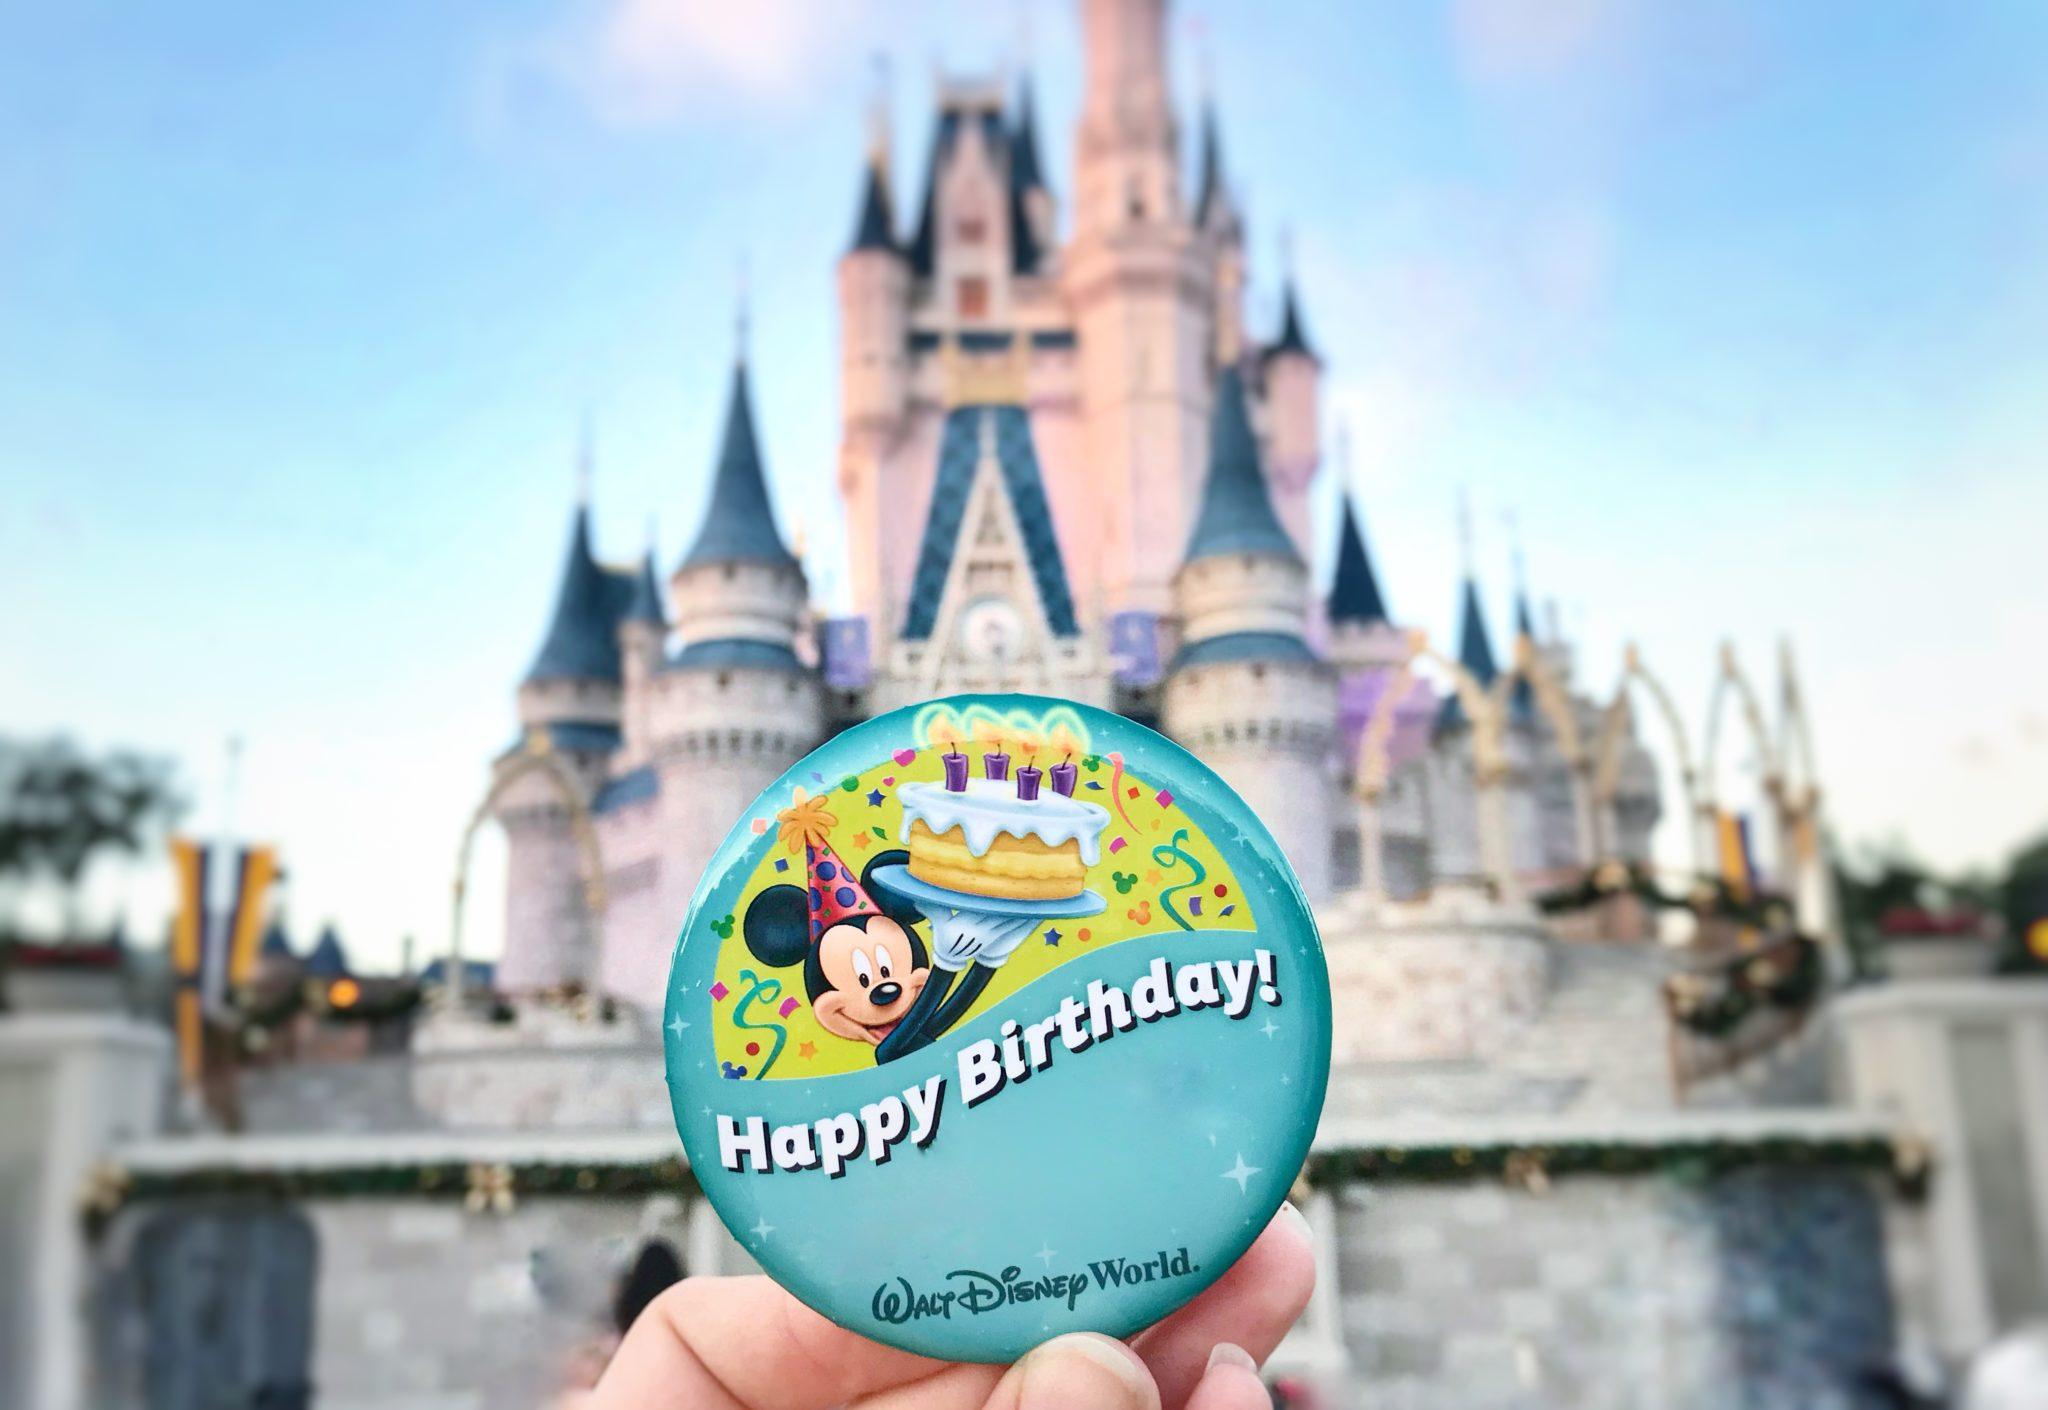 7 Free Ways To Celebrate Your Birthday At Disney World